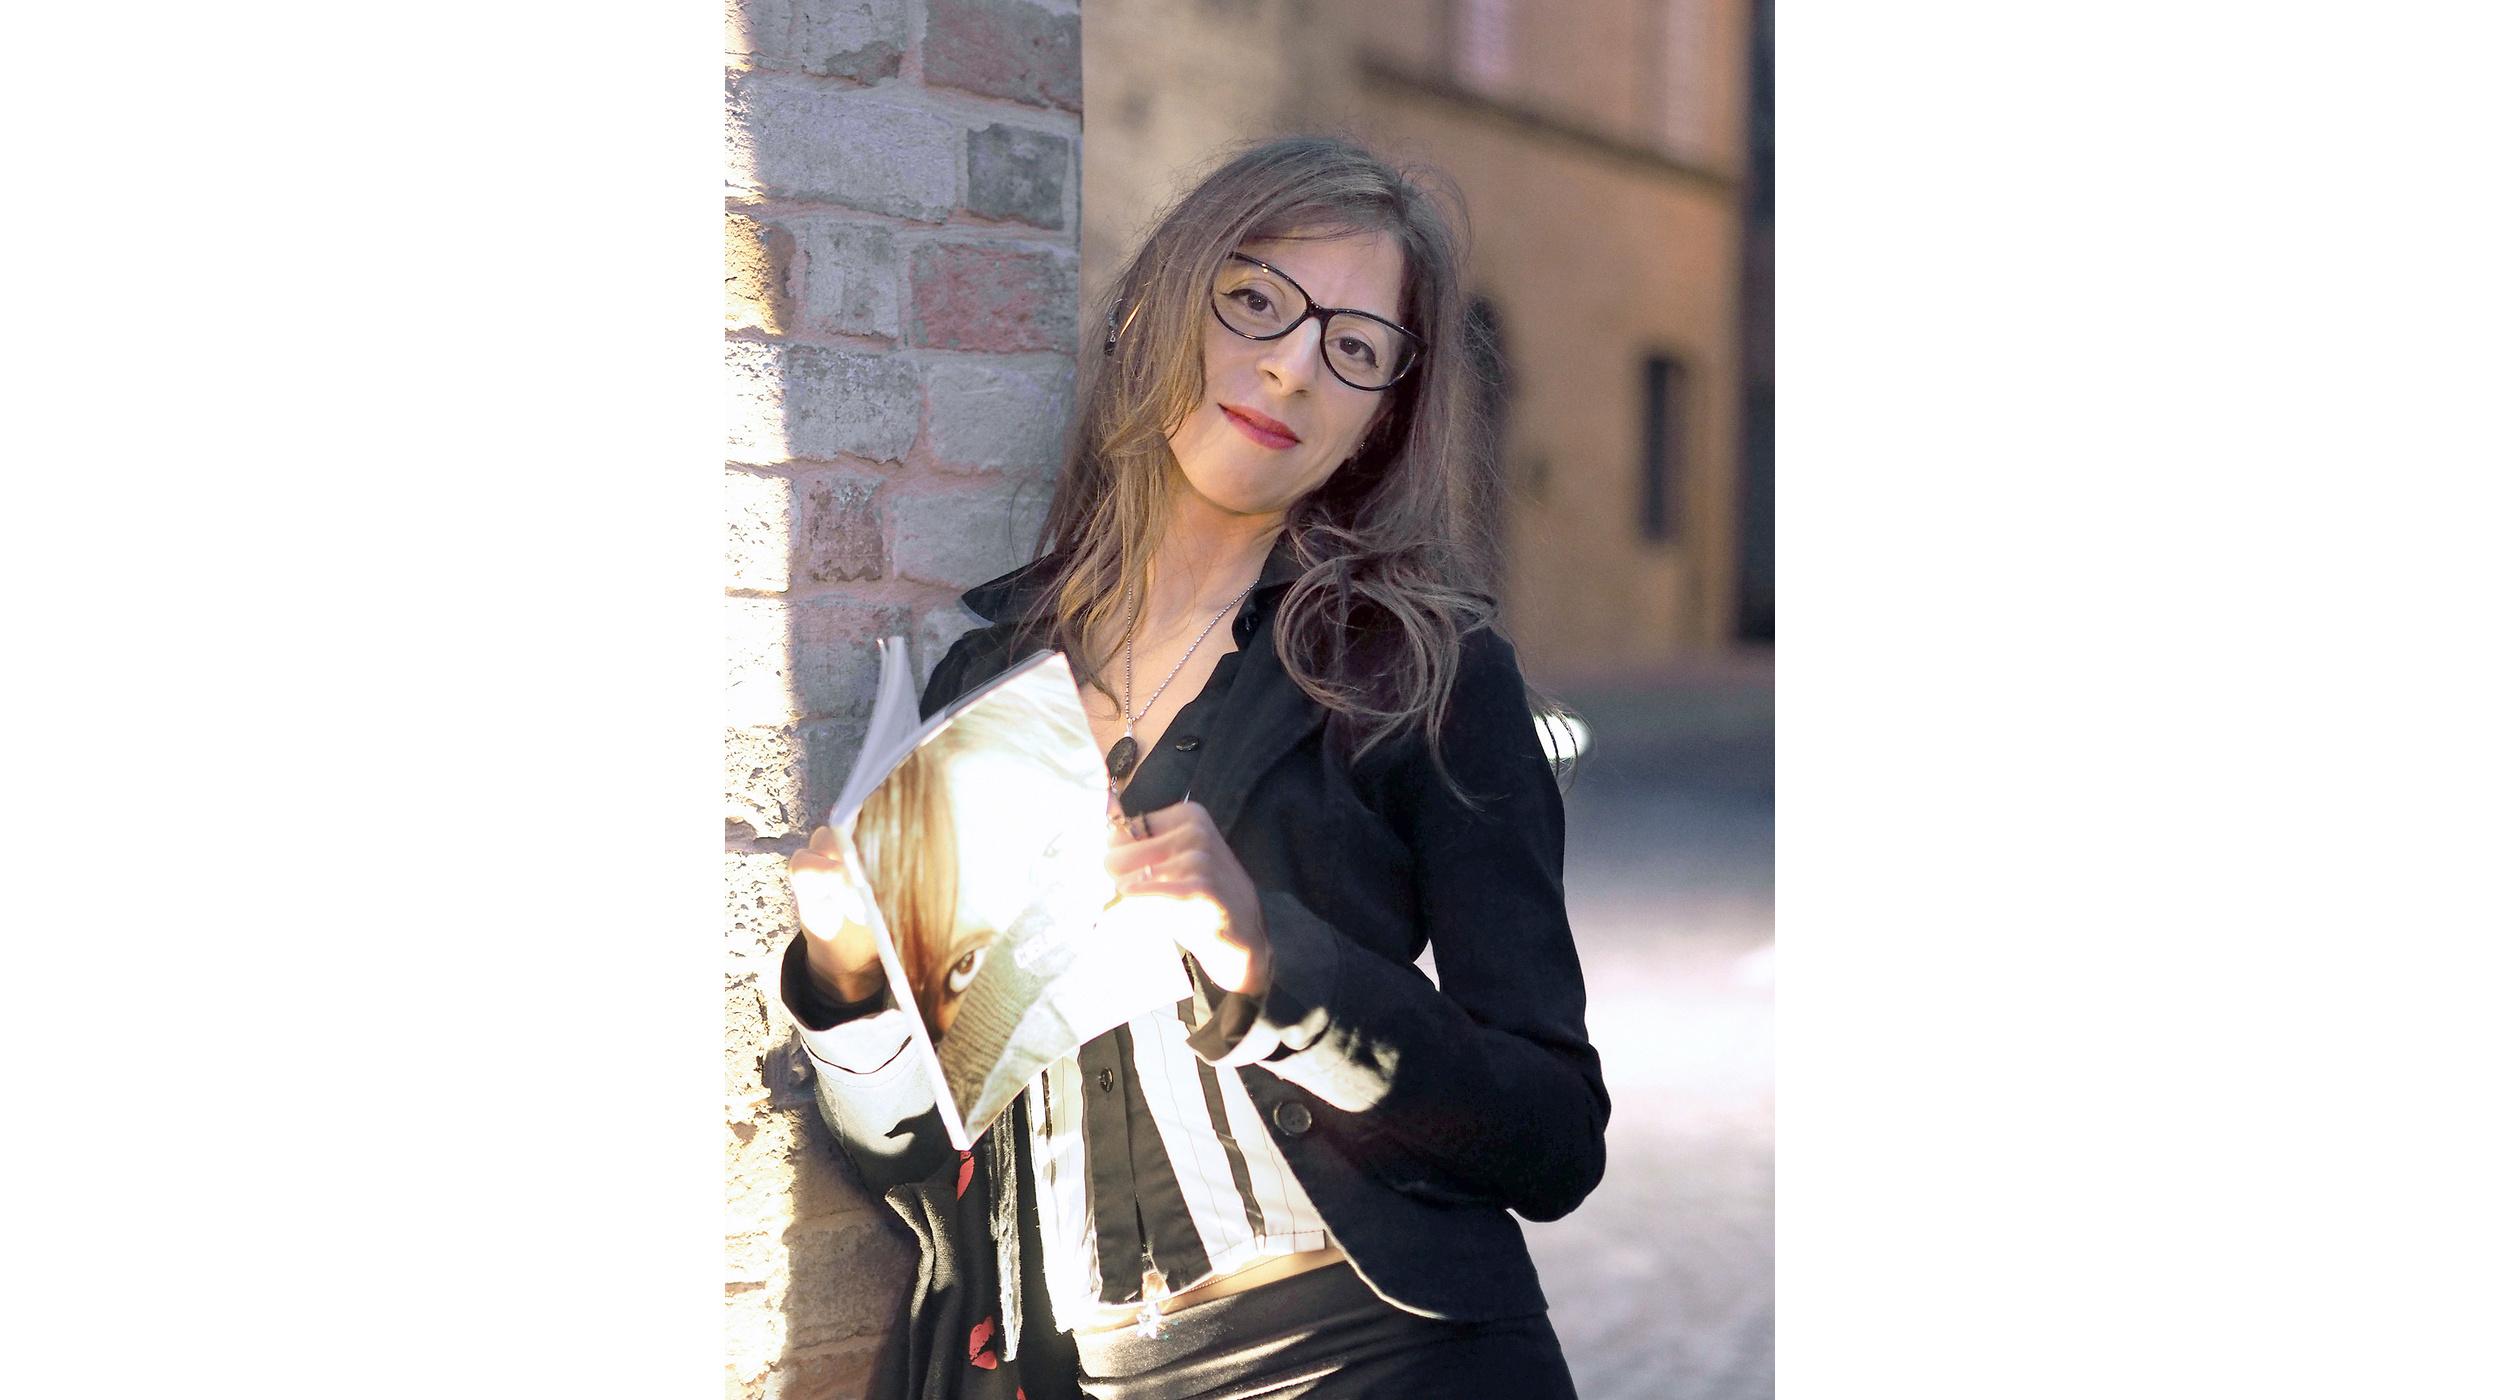 Nadia Nunzi